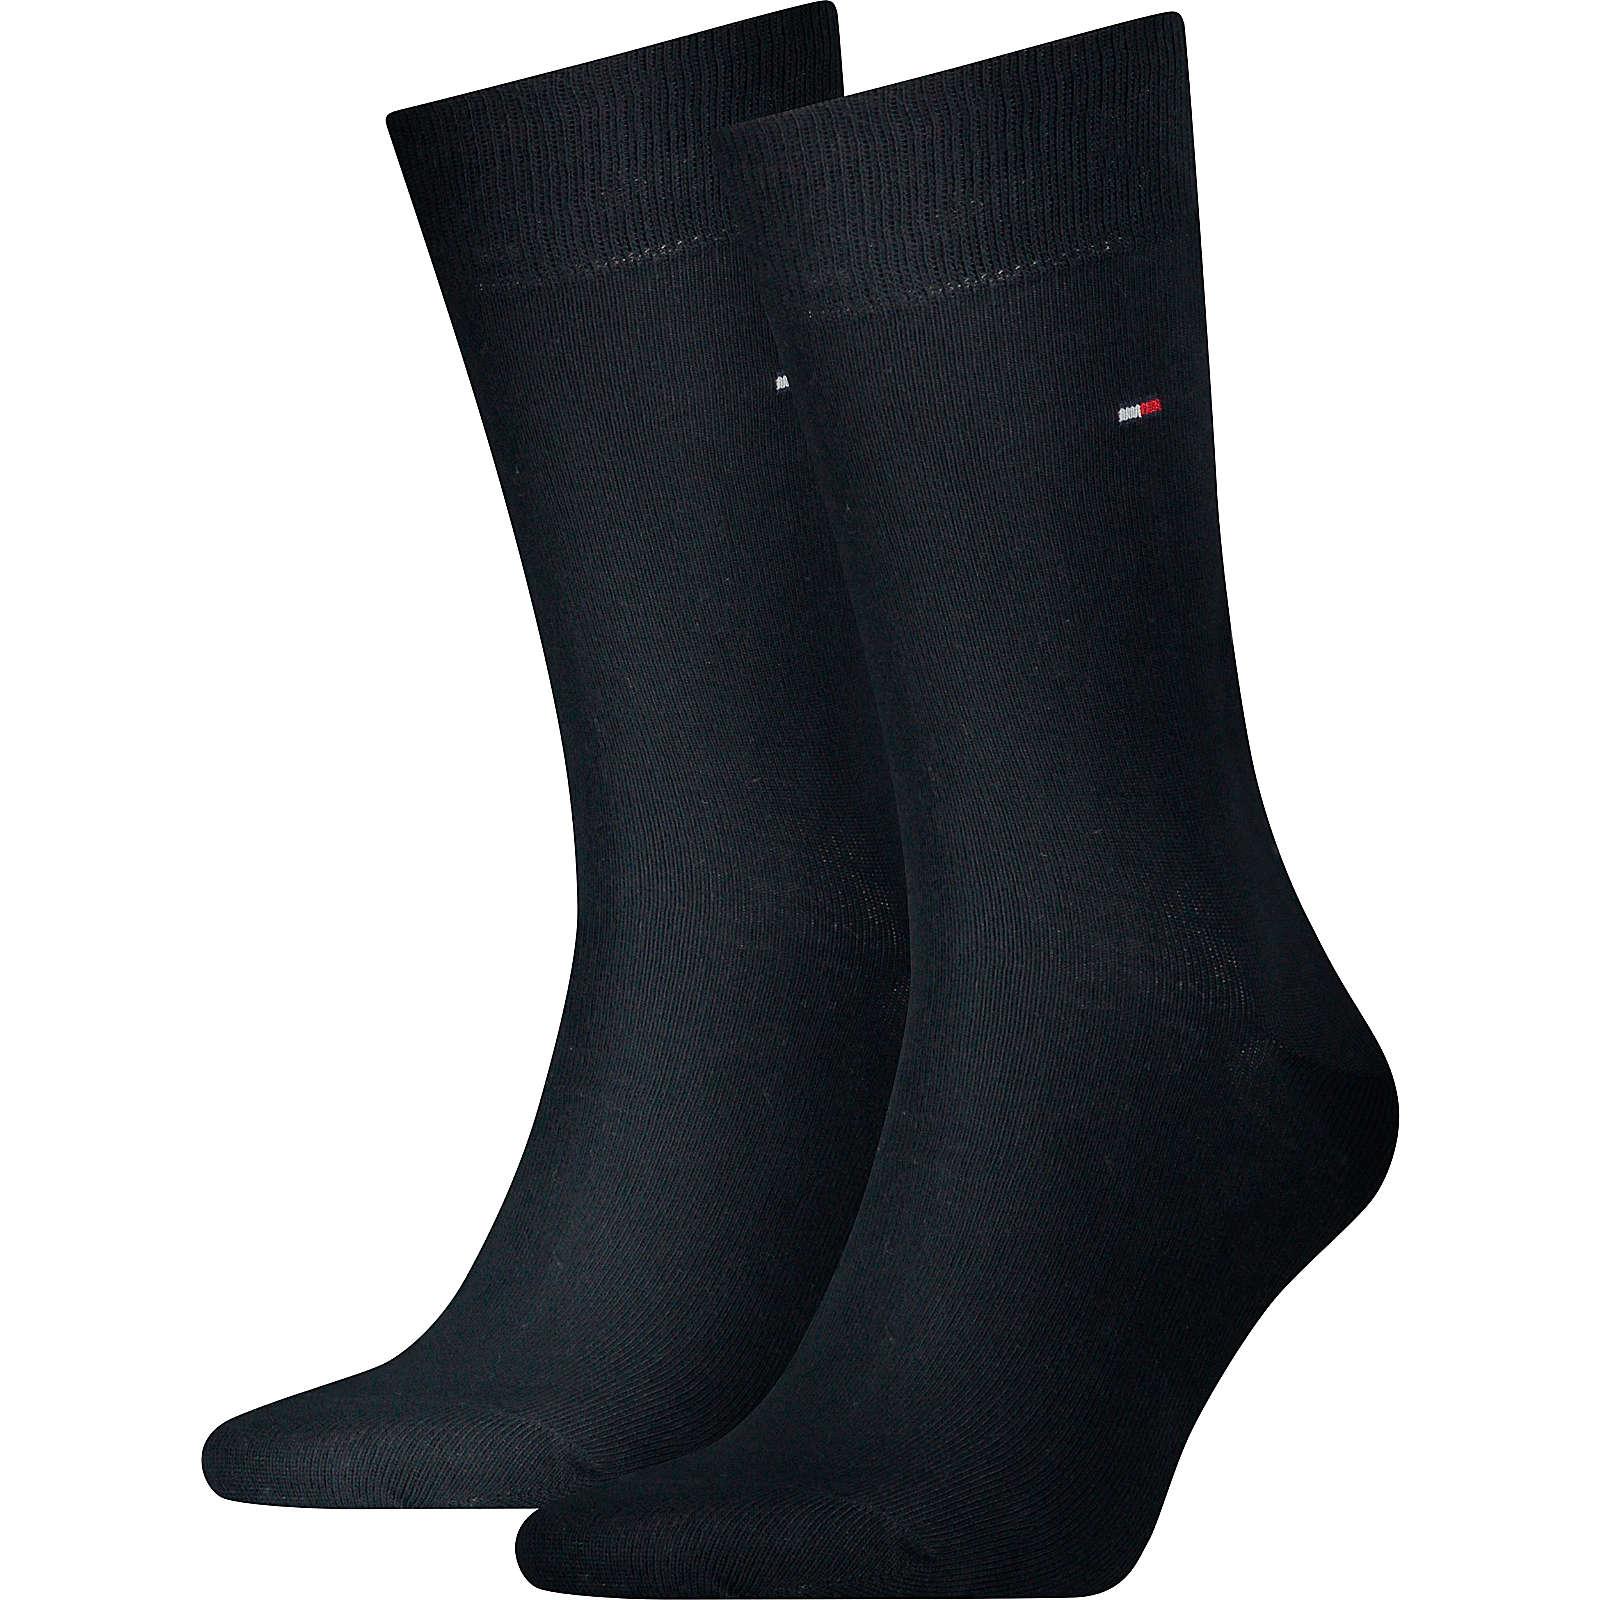 TOMMY HILFIGER 2 Paar Socken Socken dunkelblau Herren Gr. 39-42